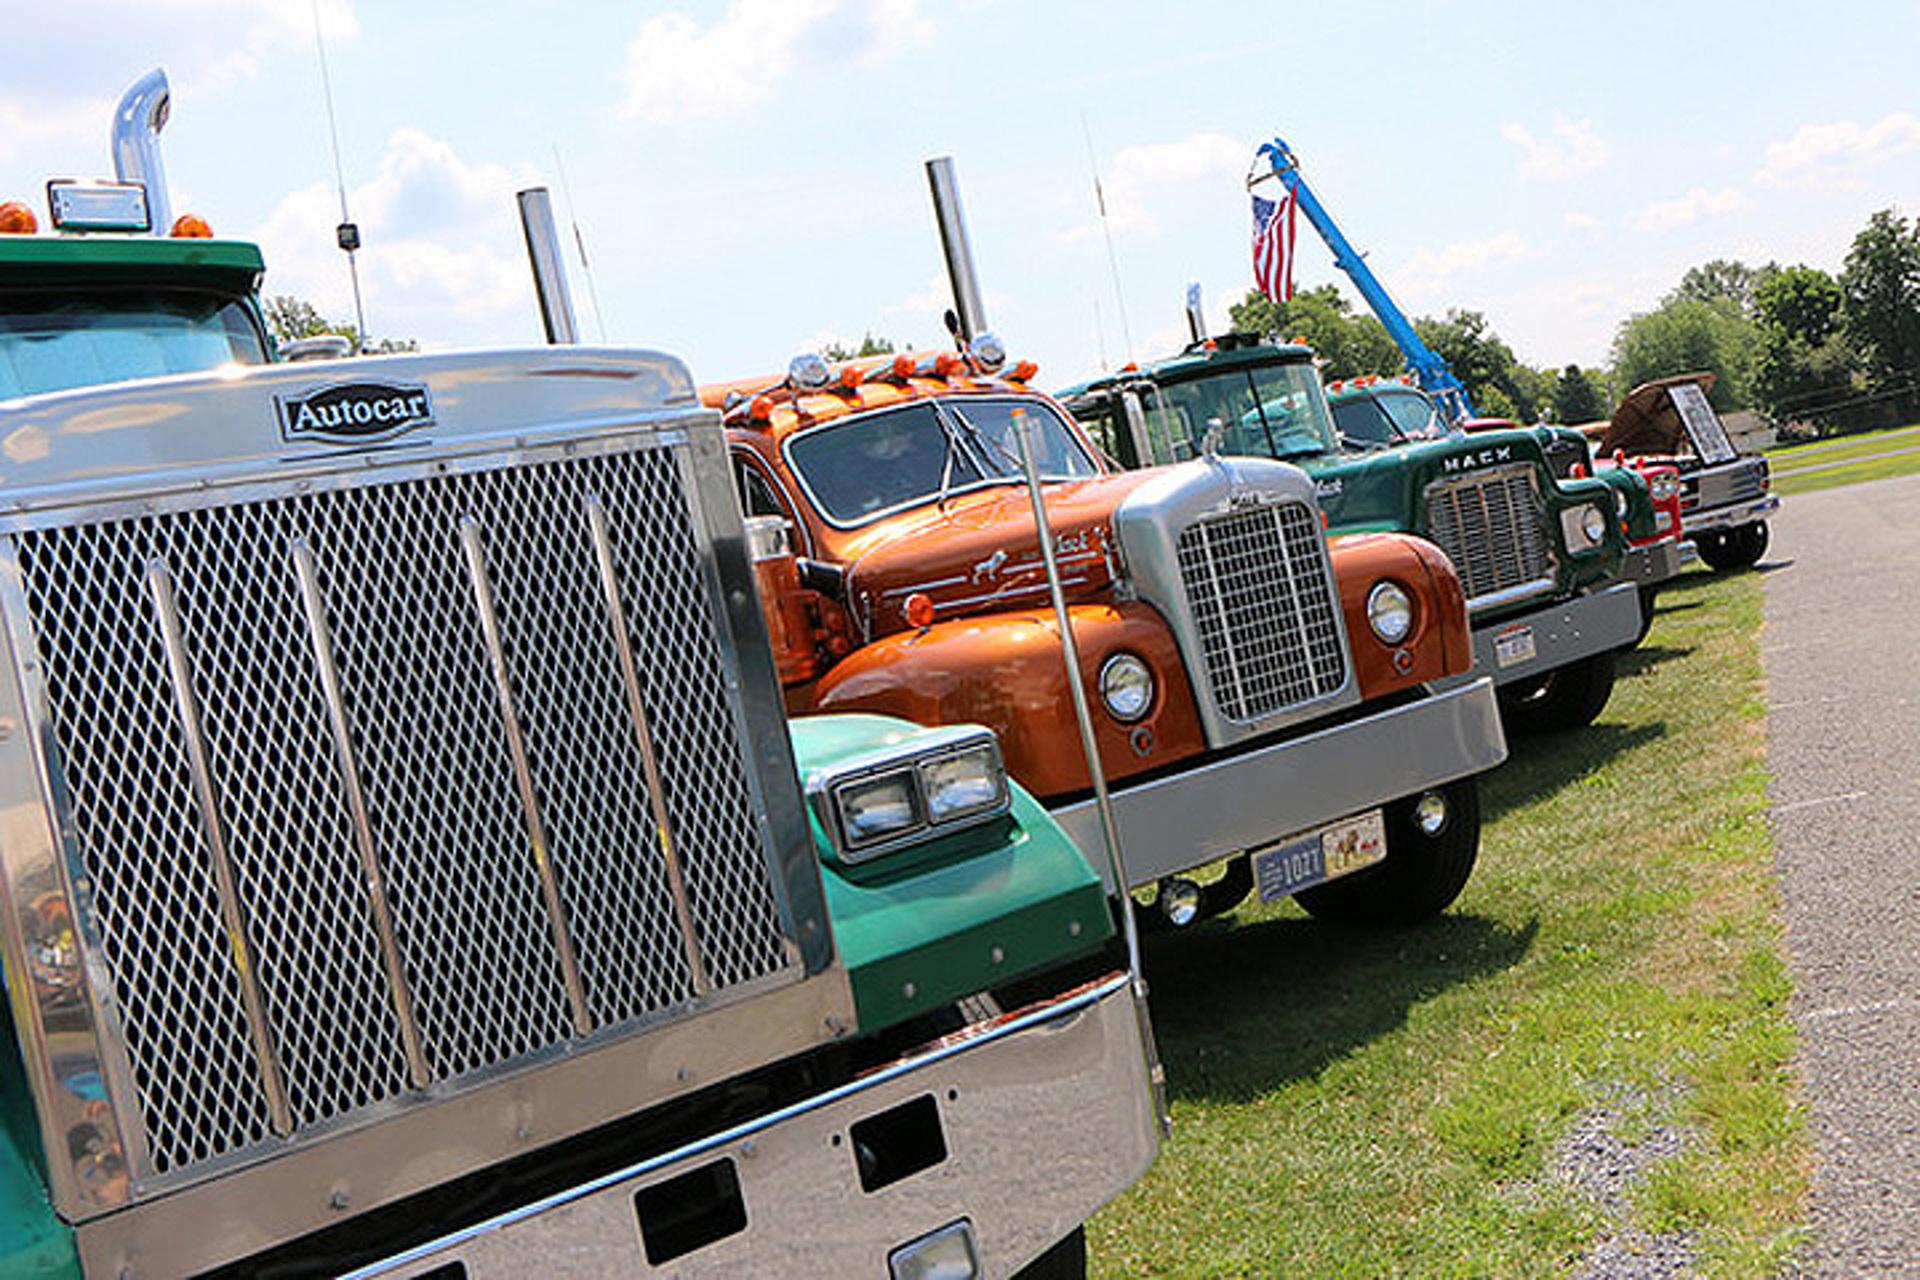 Scratch Pebble Beach, Carlisle Truck National Looks More Fun